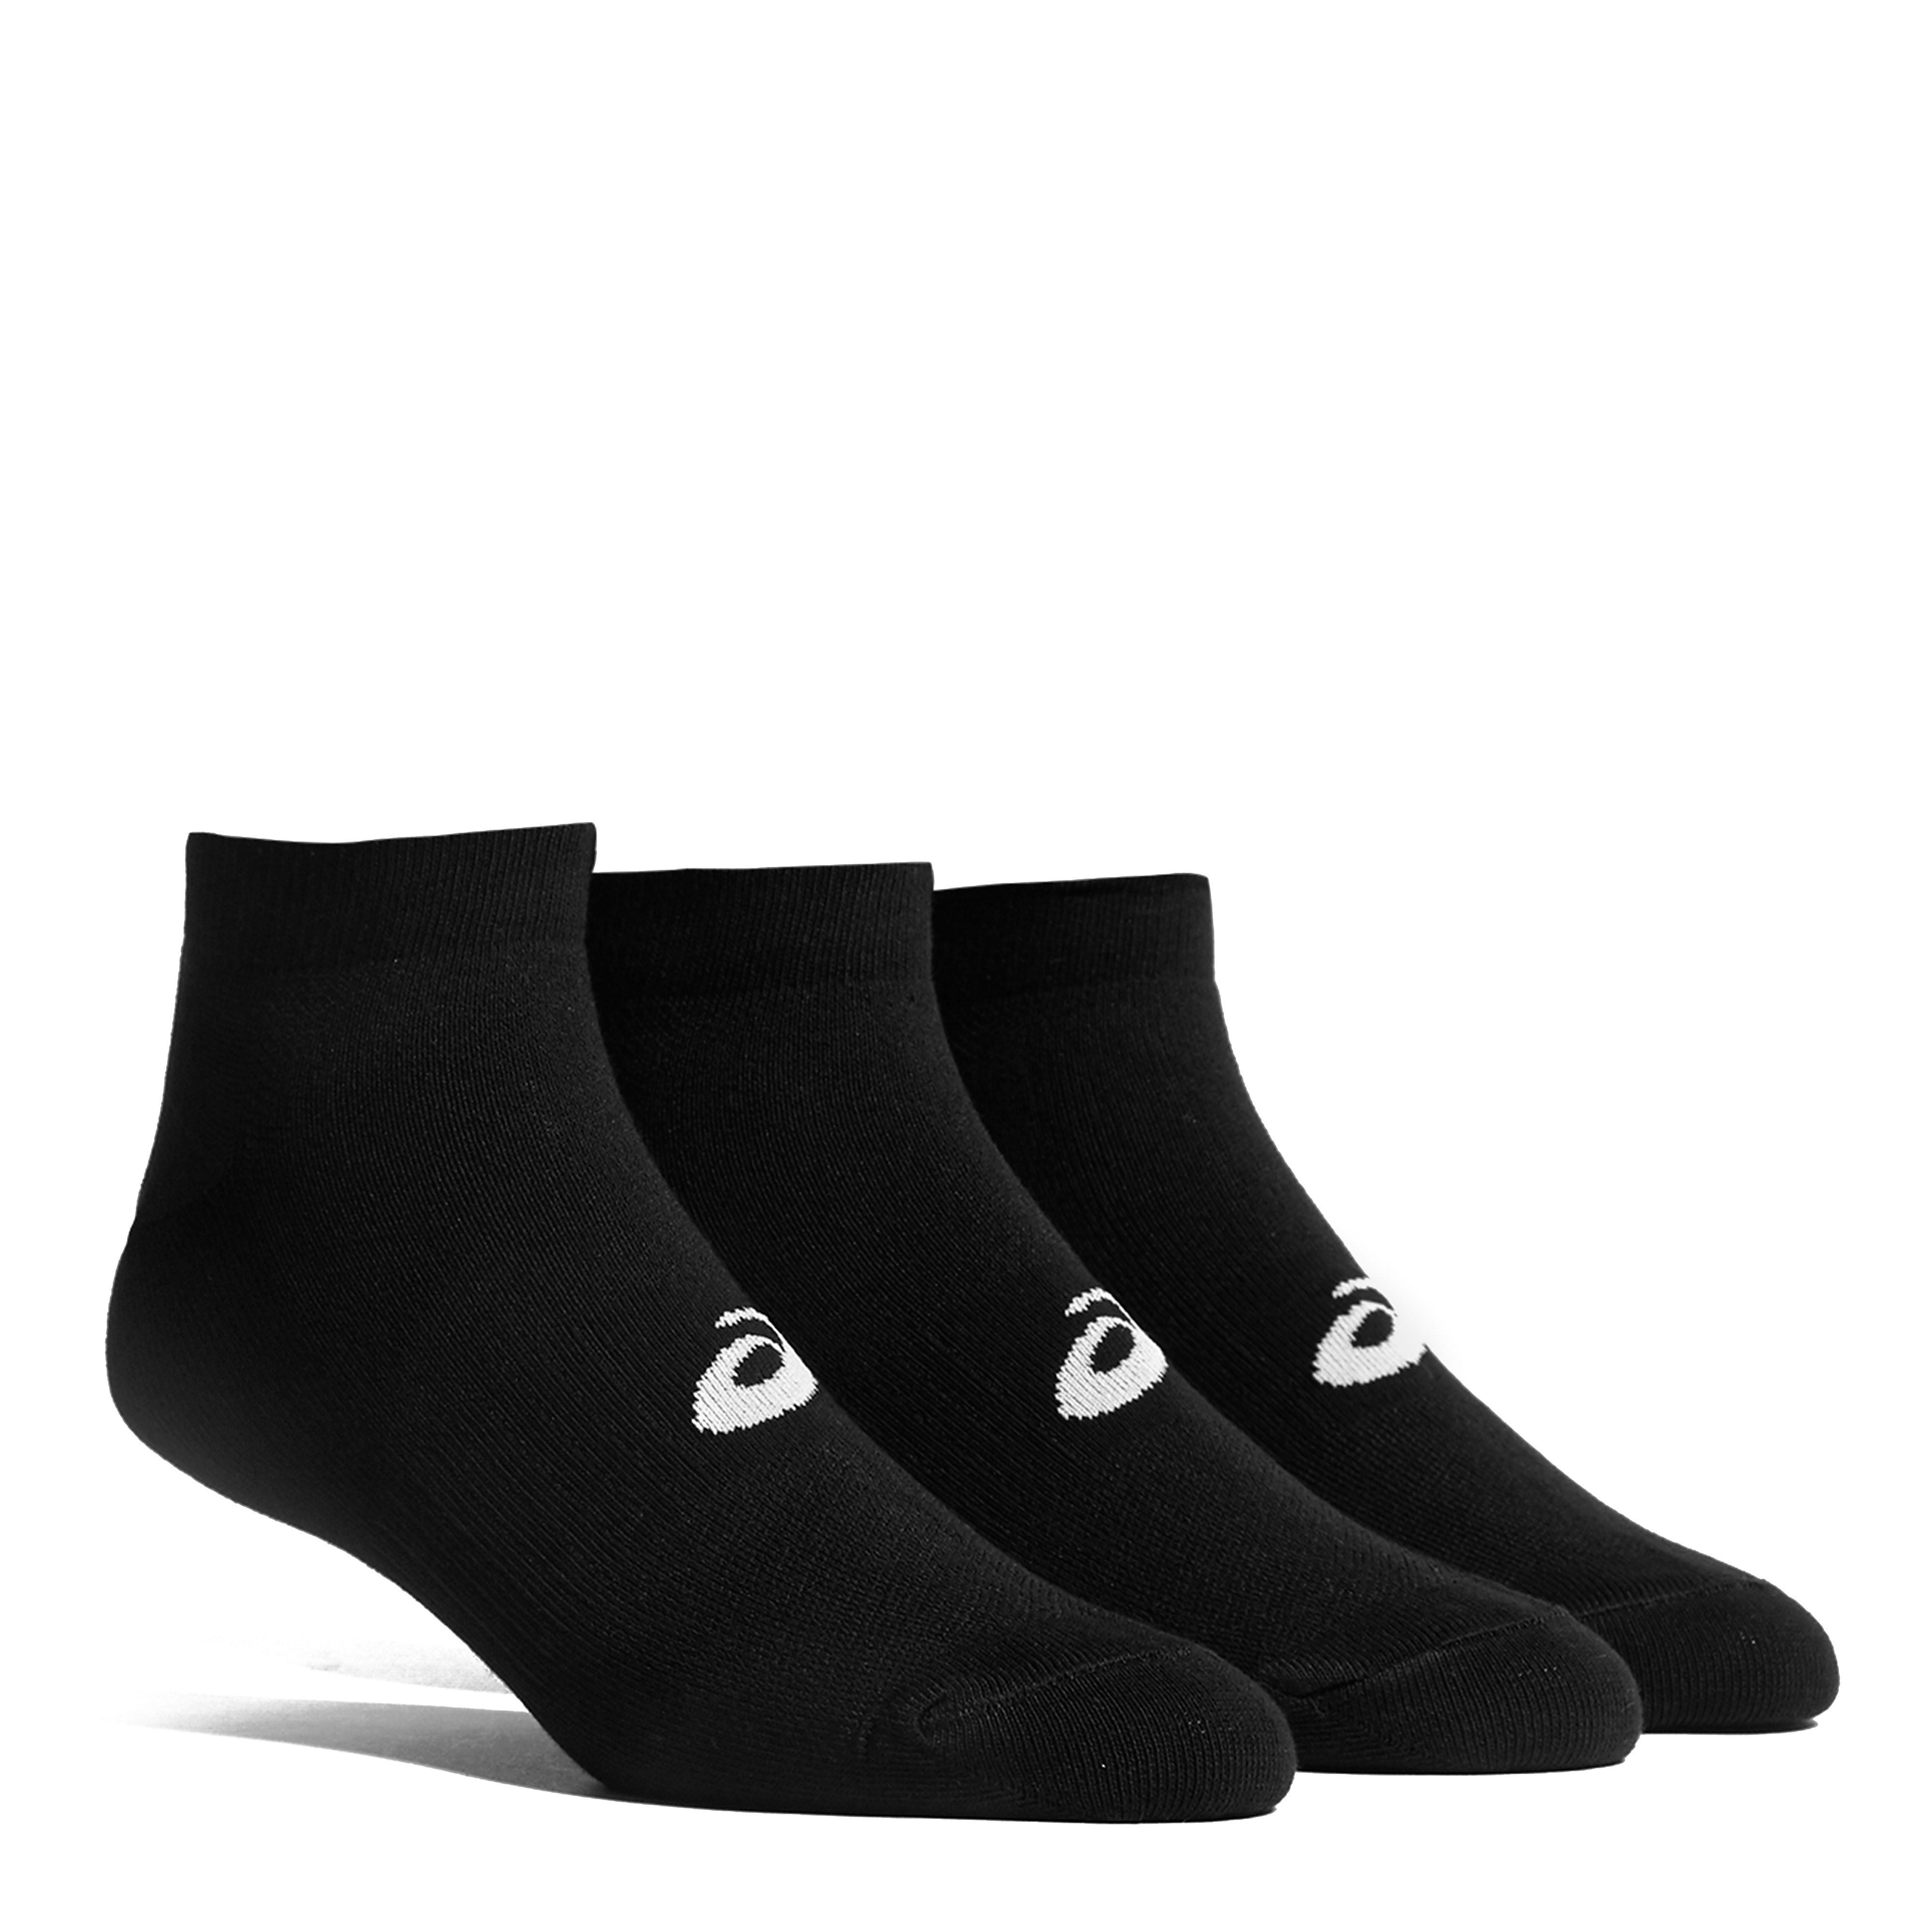 ASICS PED Socks (3 Pairs)